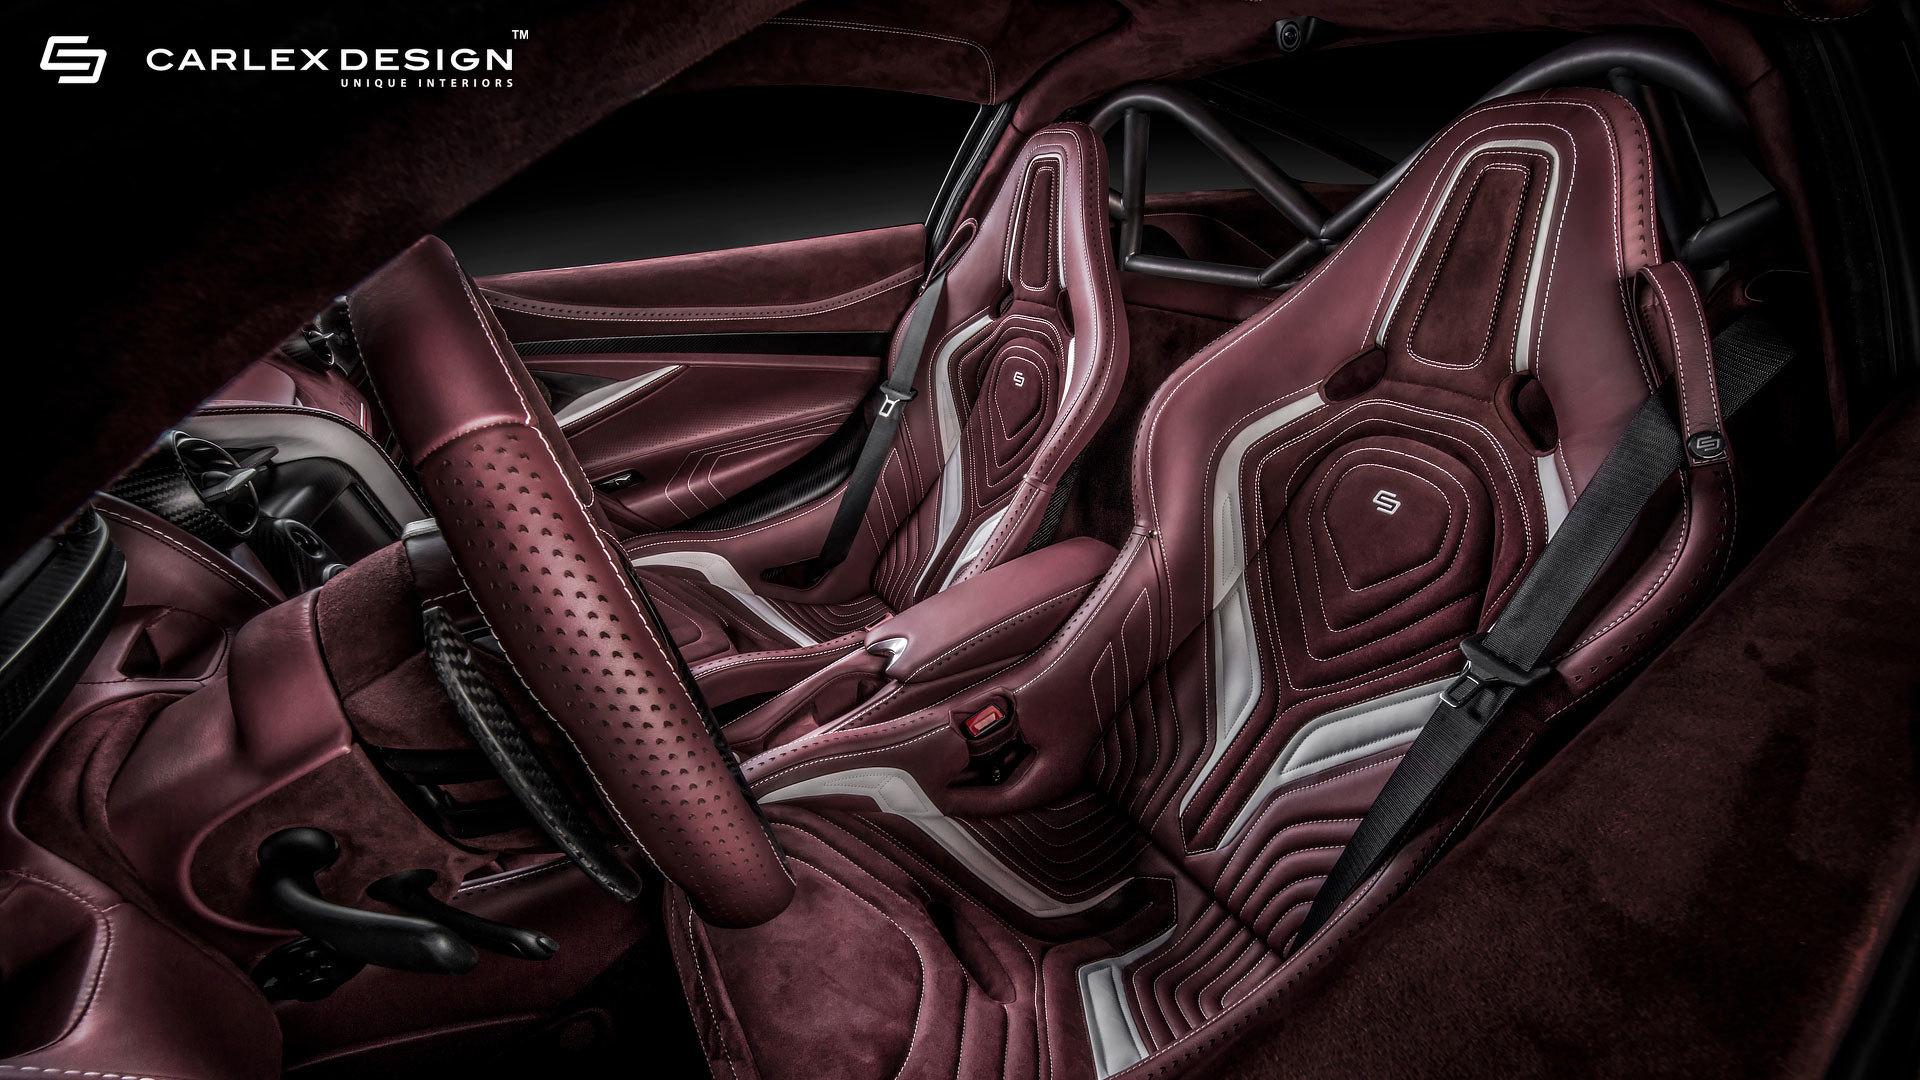 mclaren-720s-by-carlex-design (9)